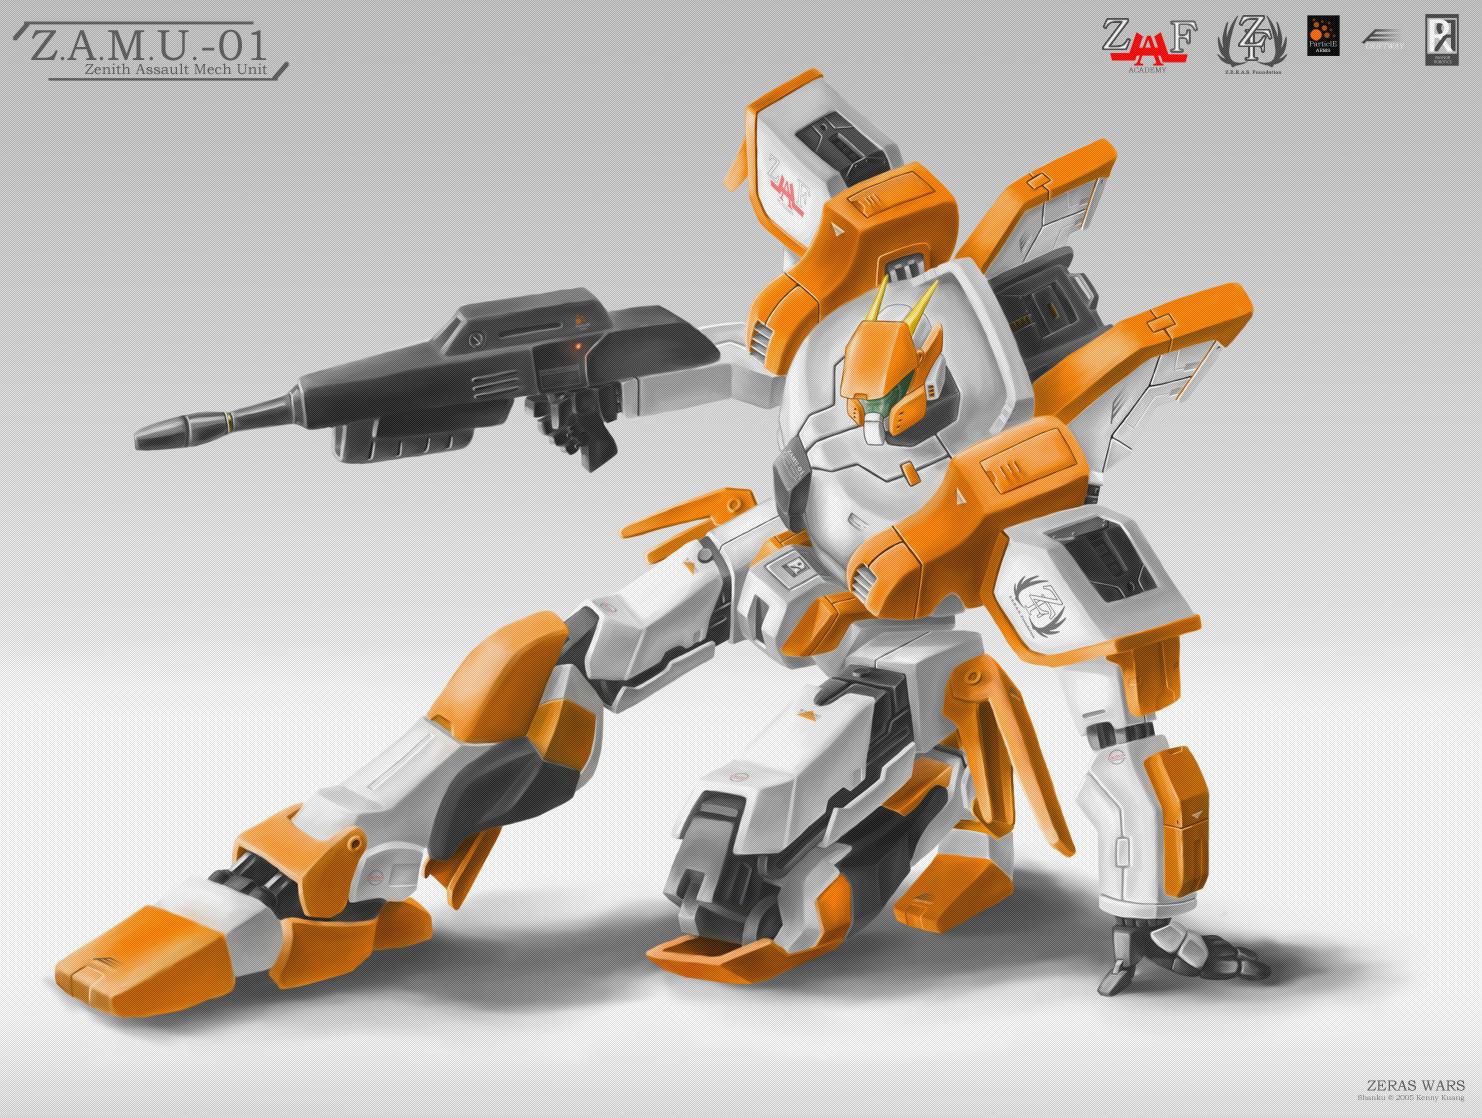 Z.A.M.U. - 01 by shanku